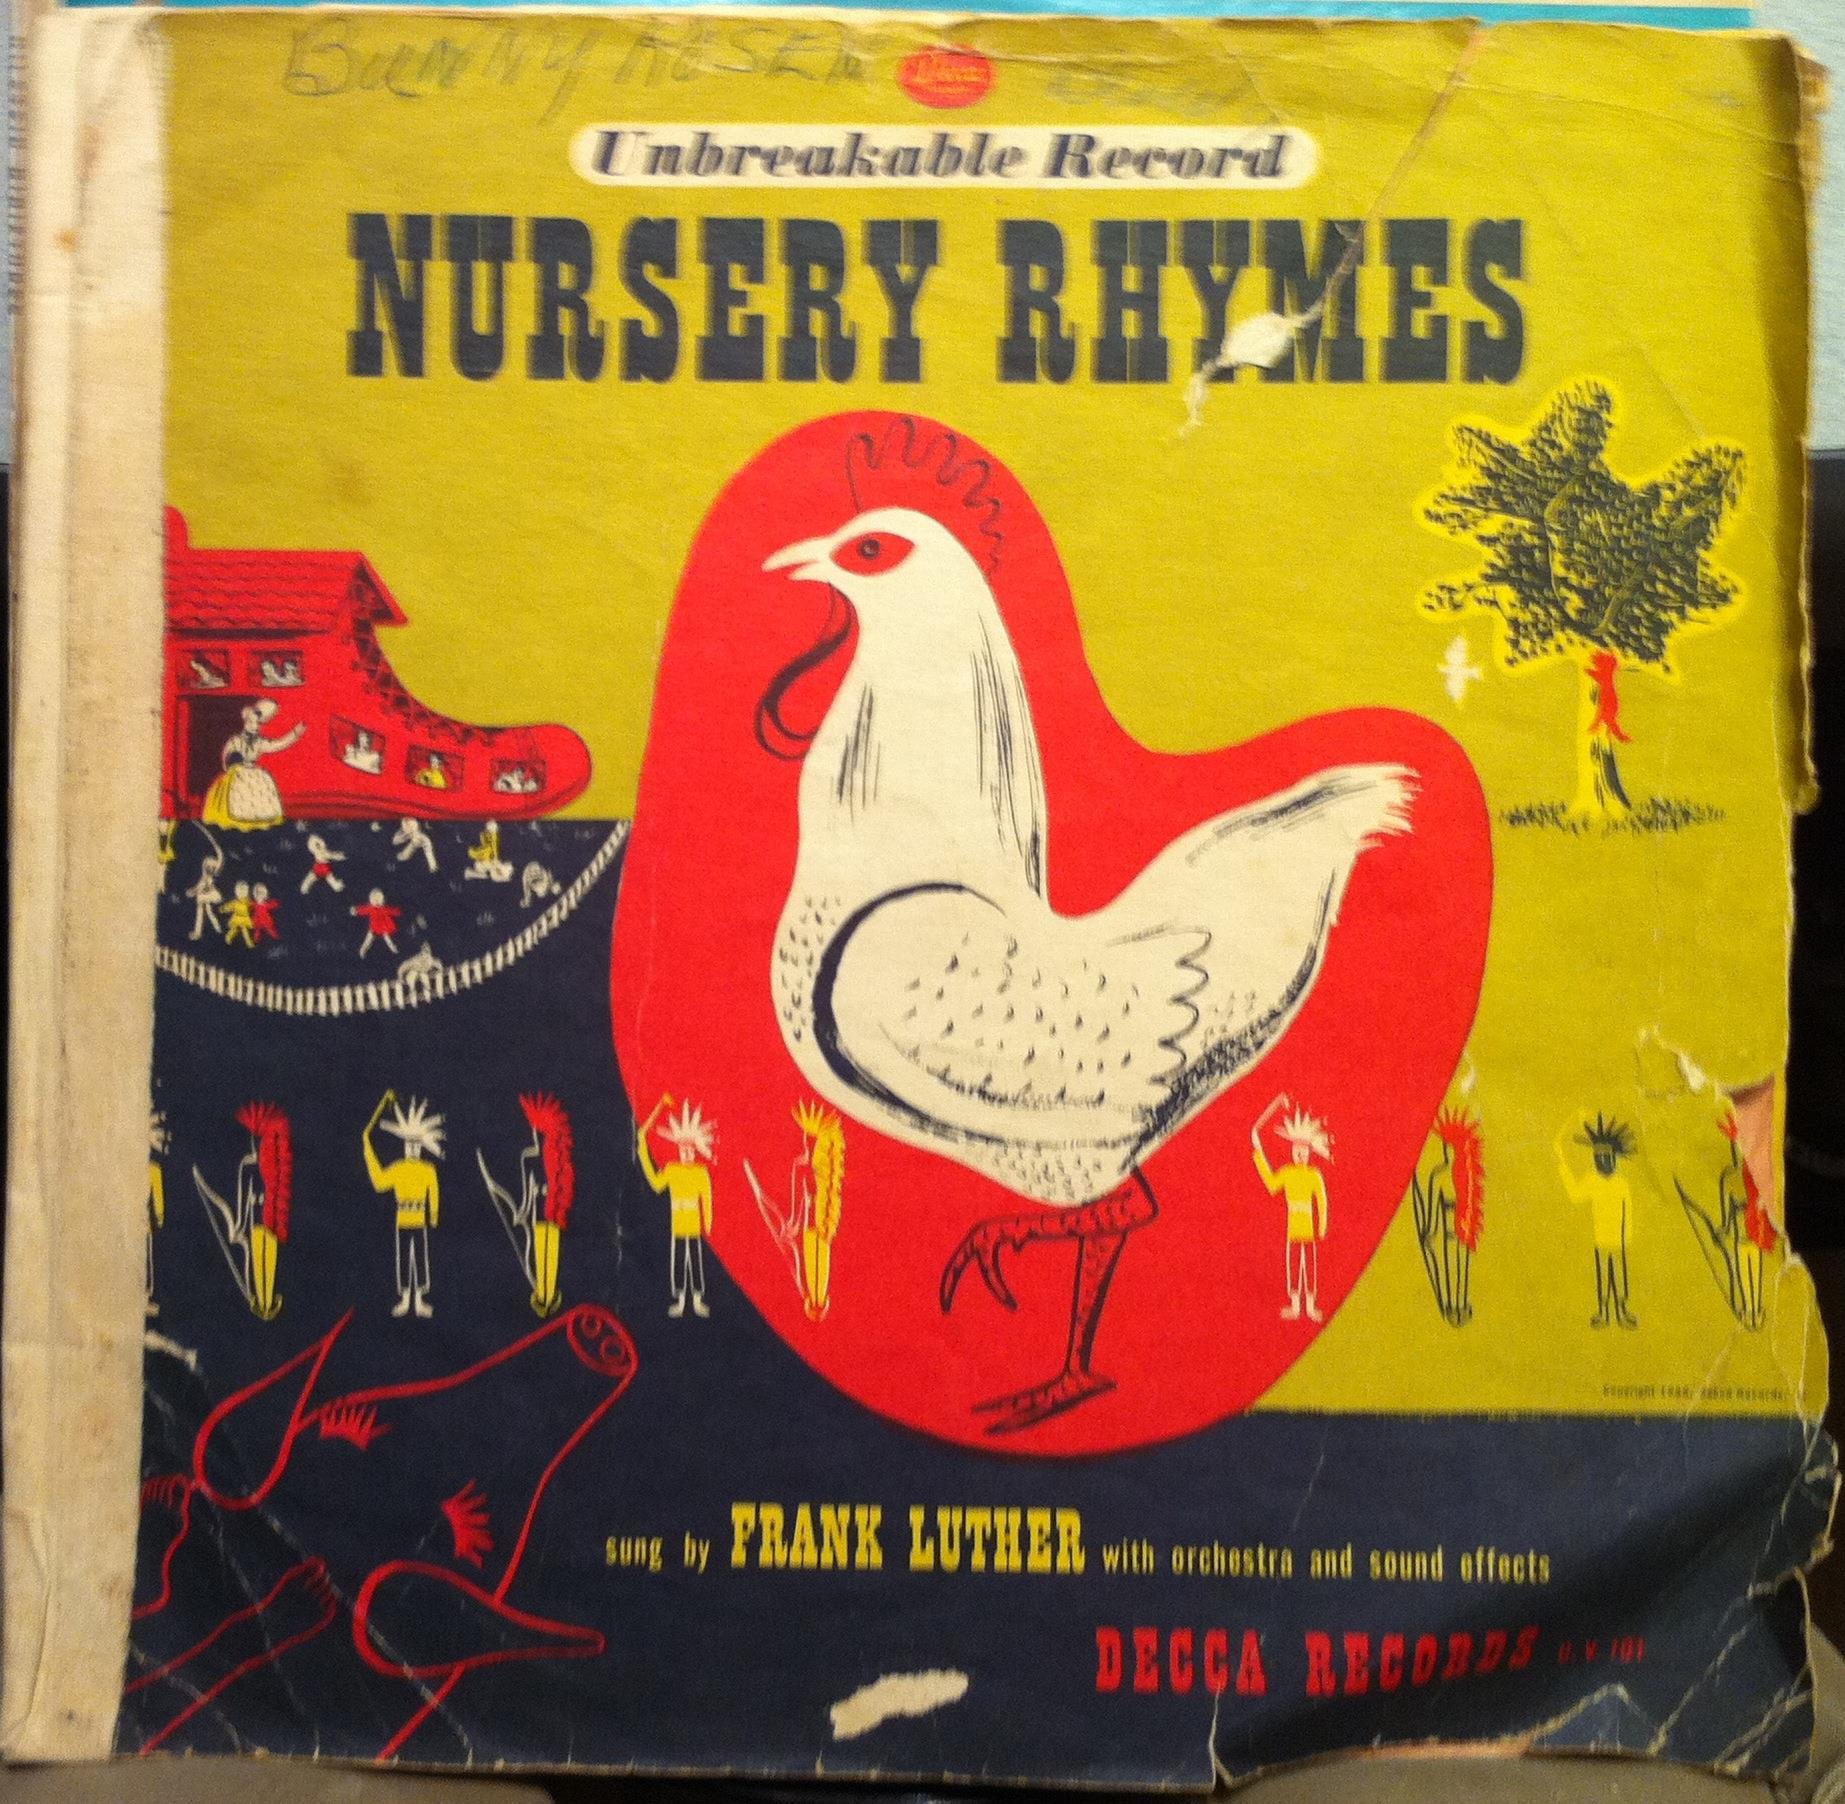 FRANK LUTHER Nursery Rhymes Mother Goose Songs 2 LP P DV